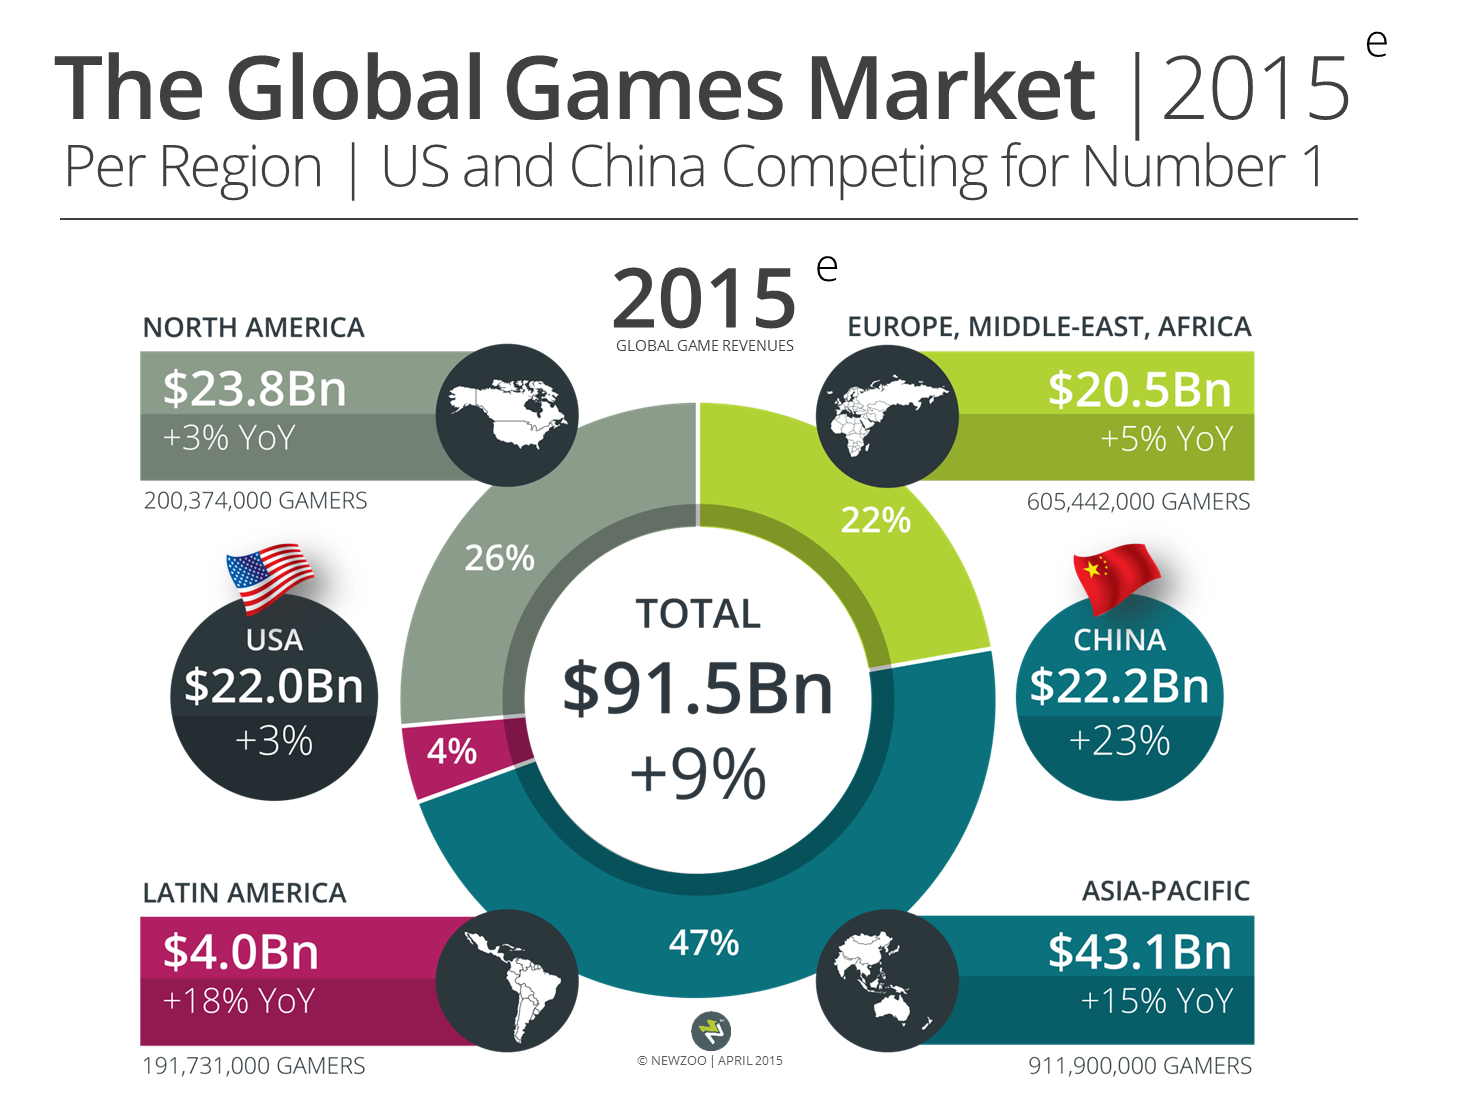 Newzoo_Global_Games_Market_2015_Per_Region_US_China_V1_Transparent Corrected